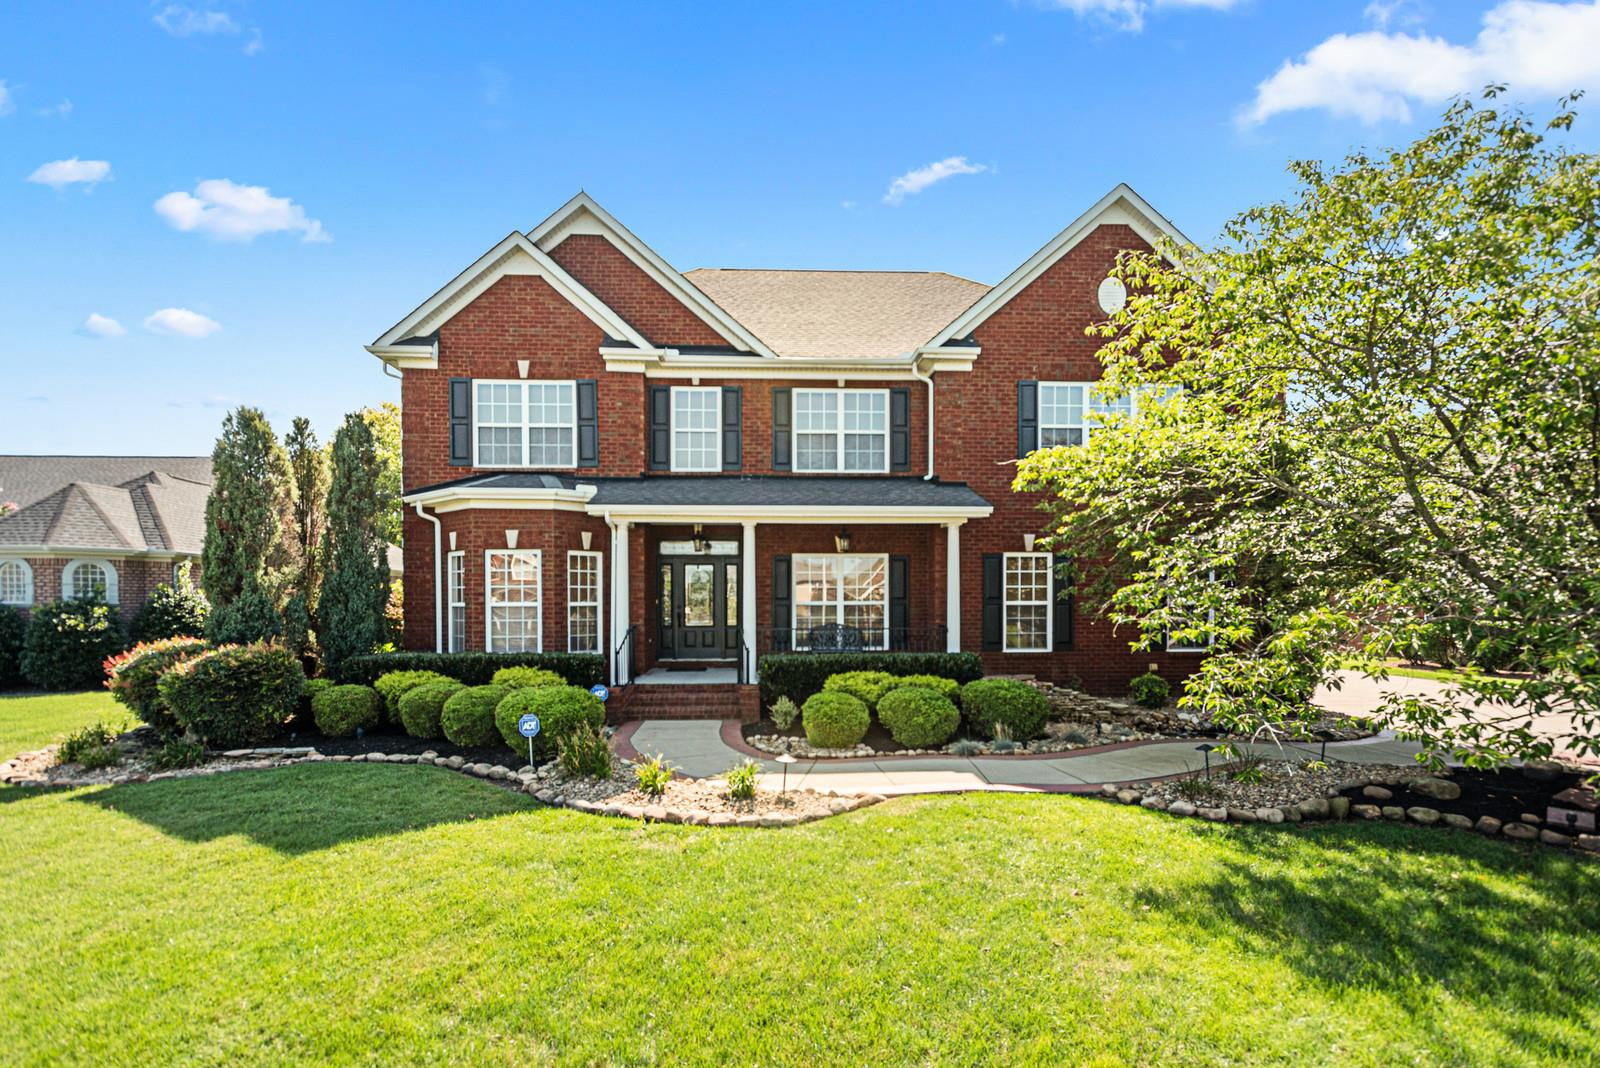 2644 Jim Houston Ct, Murfreesboro, TN 37129 - Murfreesboro, TN real estate listing